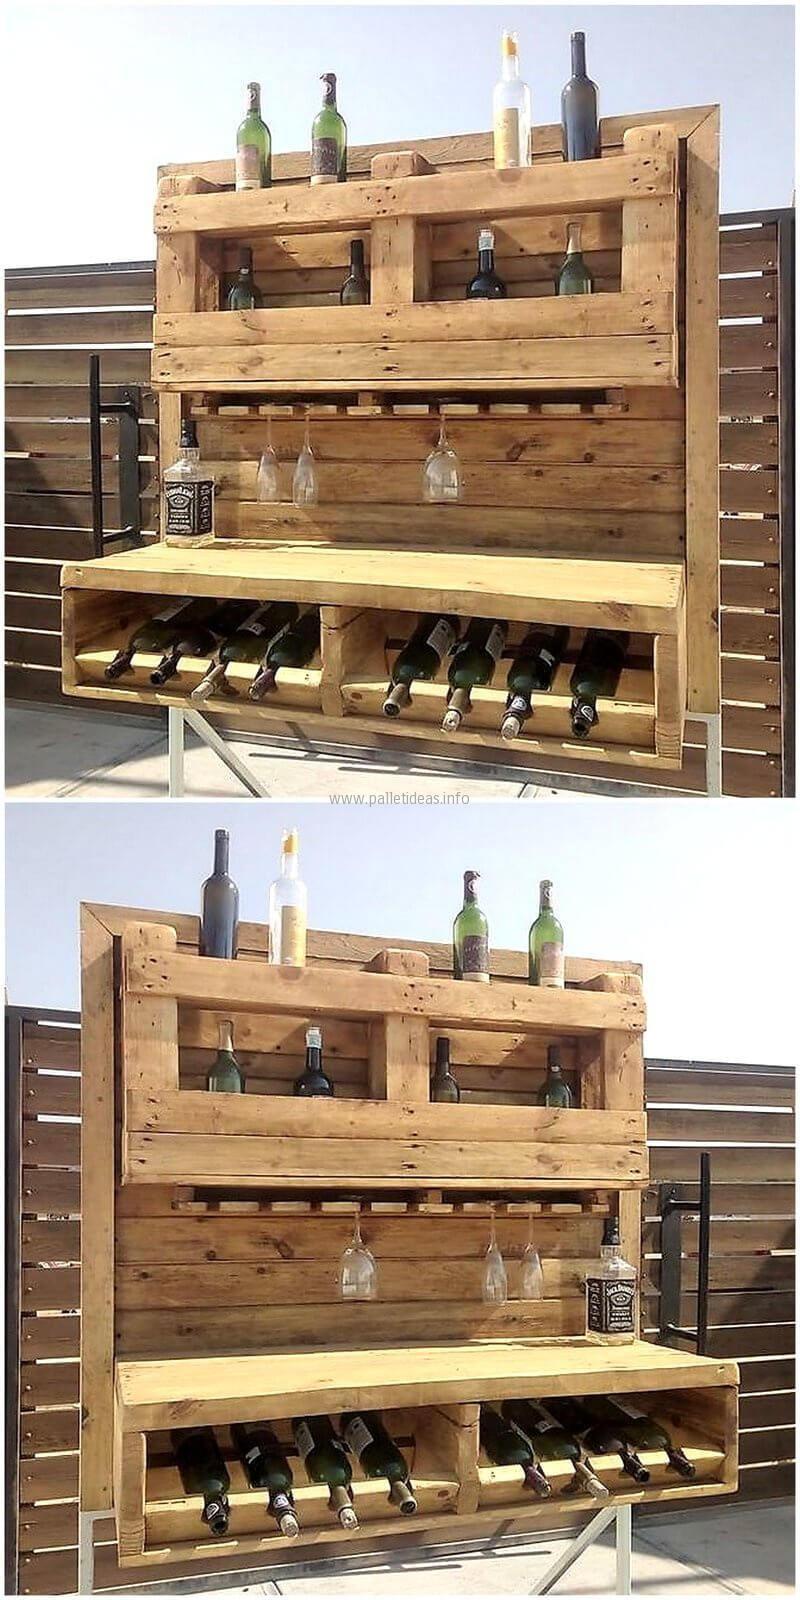 pallet wall bar idea | мебель из поддонов | Pinterest | Mueble bar ...